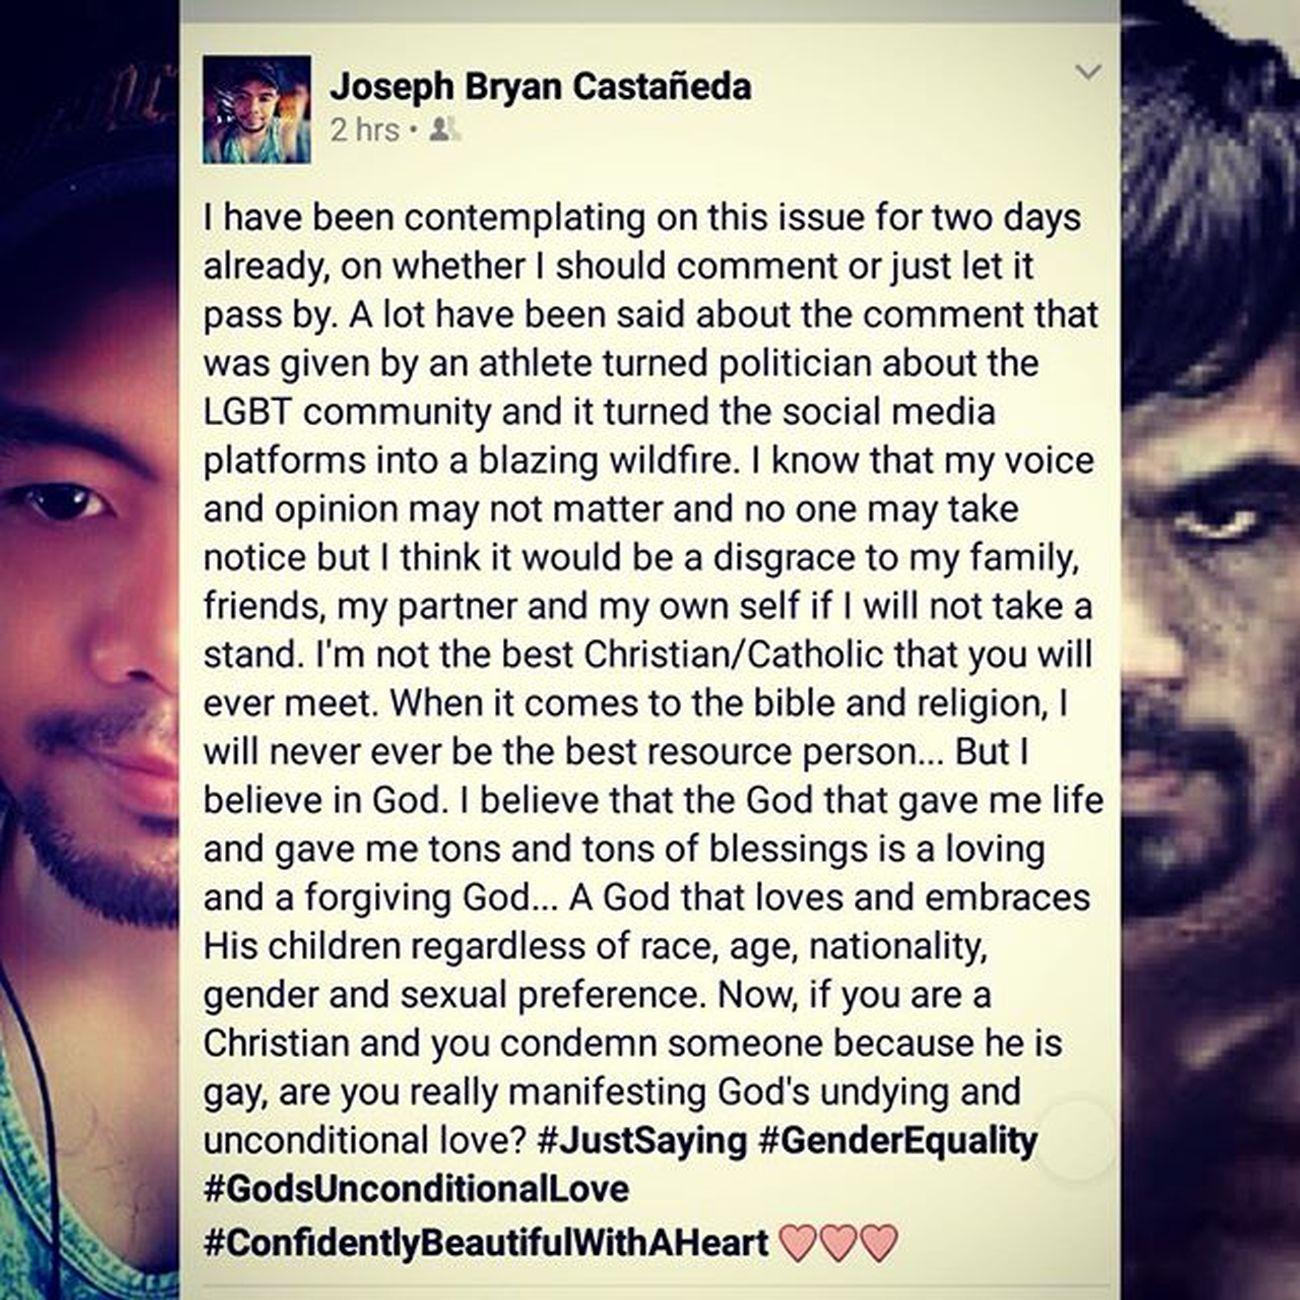 Justsaying GenderEquality GodsUnconditionalLove Confidentlybeautifulwithaheart Lovewins 😊